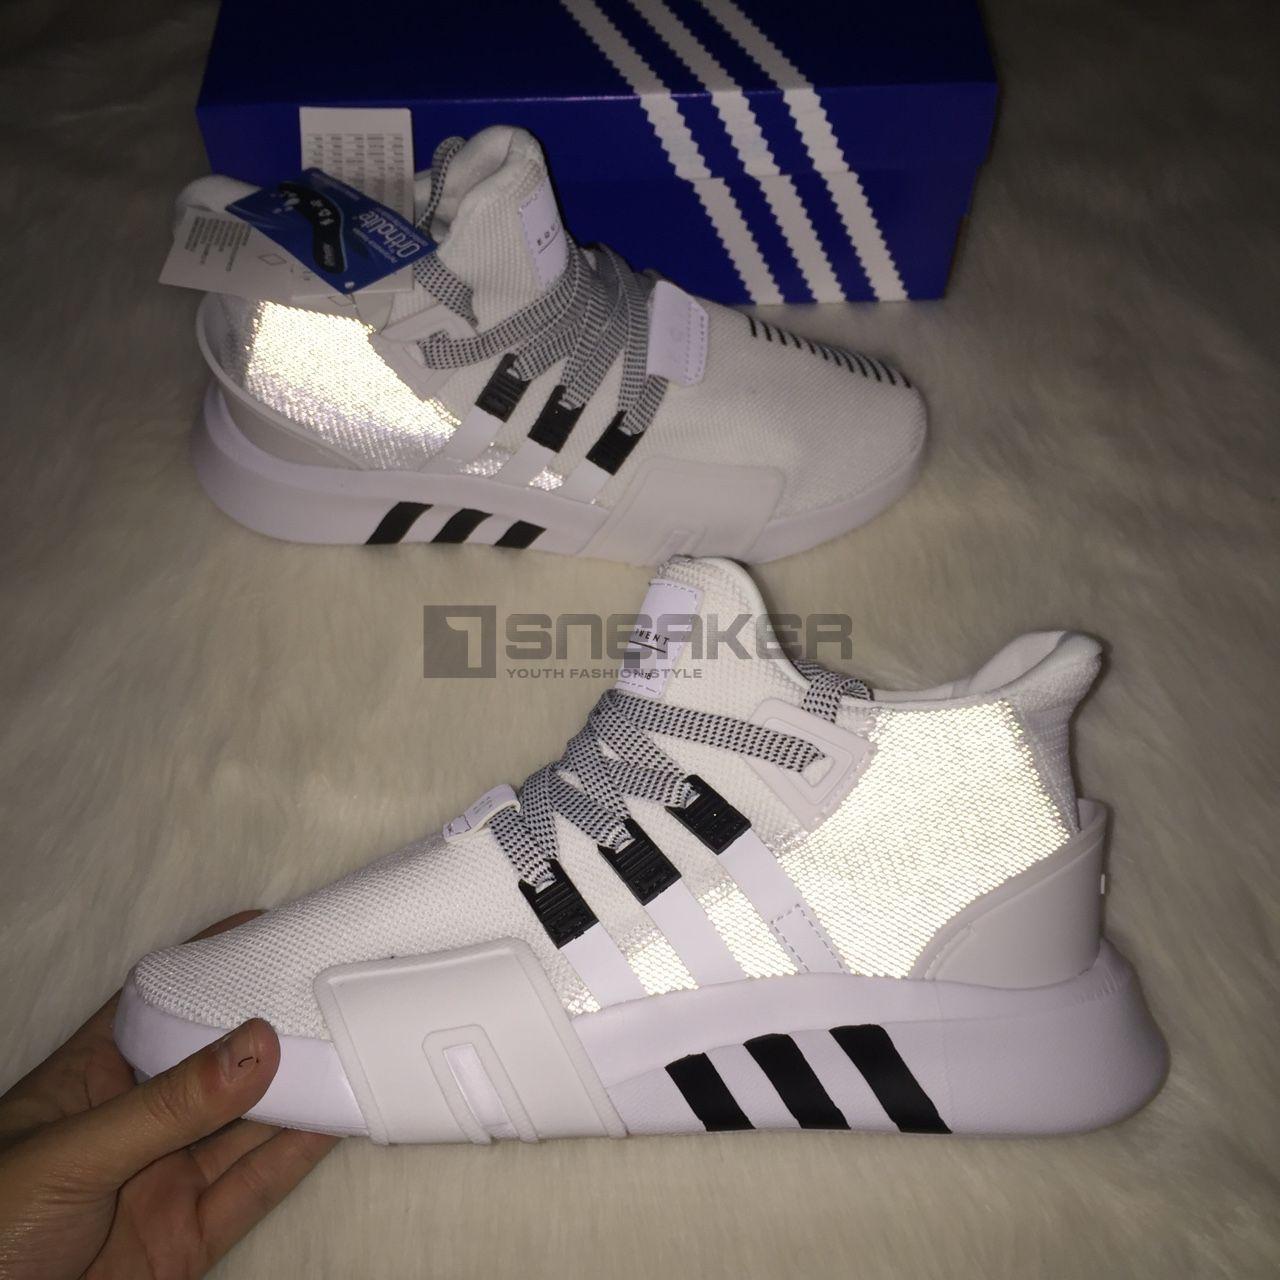 Adidas EQT Bask ADV trang den phan quang 1